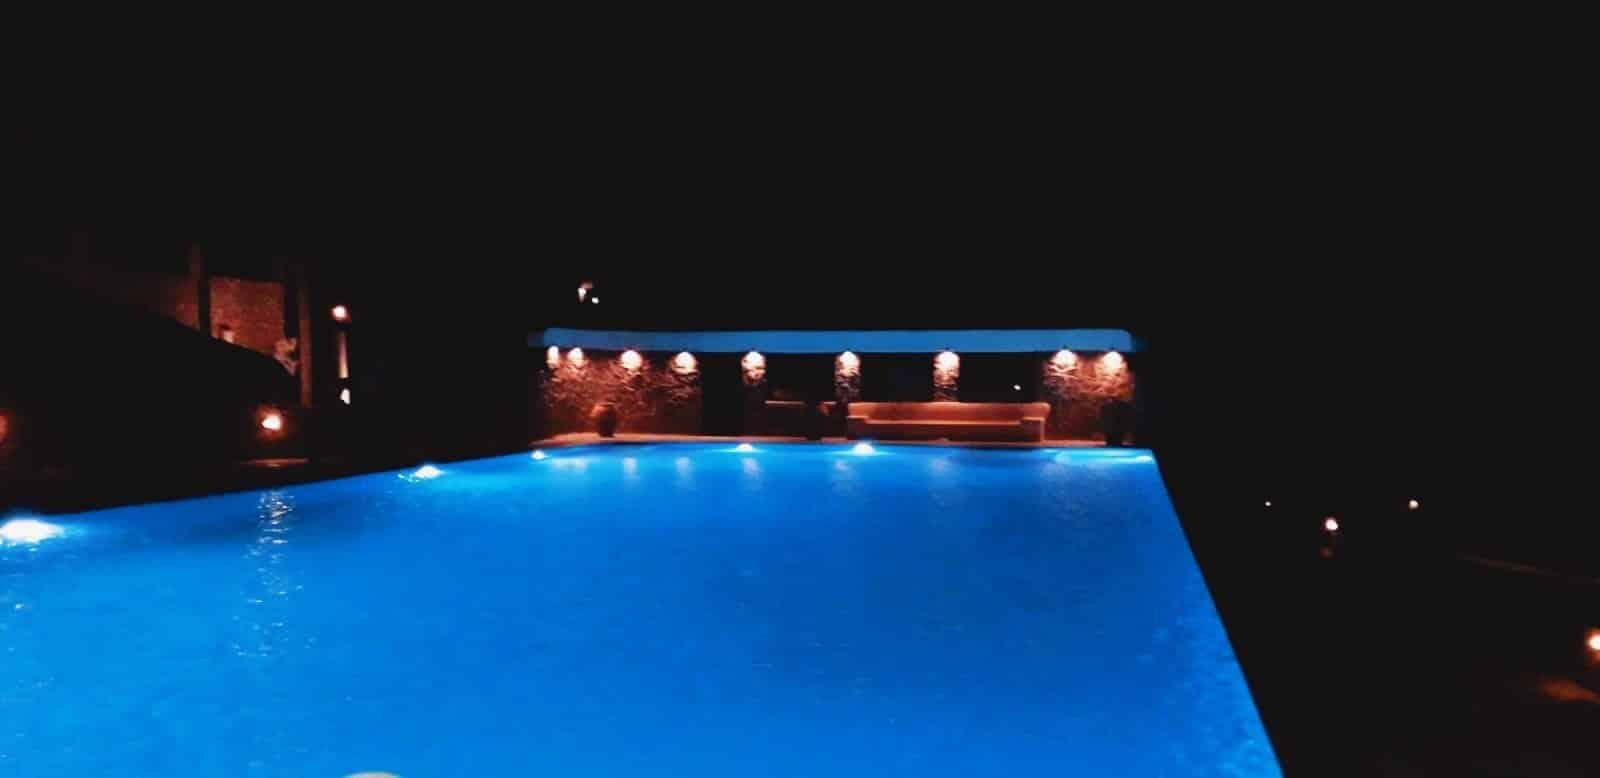 luxurious villa Mykonos - πολυτελής βίλα Μύκονος - mykonos services - οικοδομικές εργασίες 1